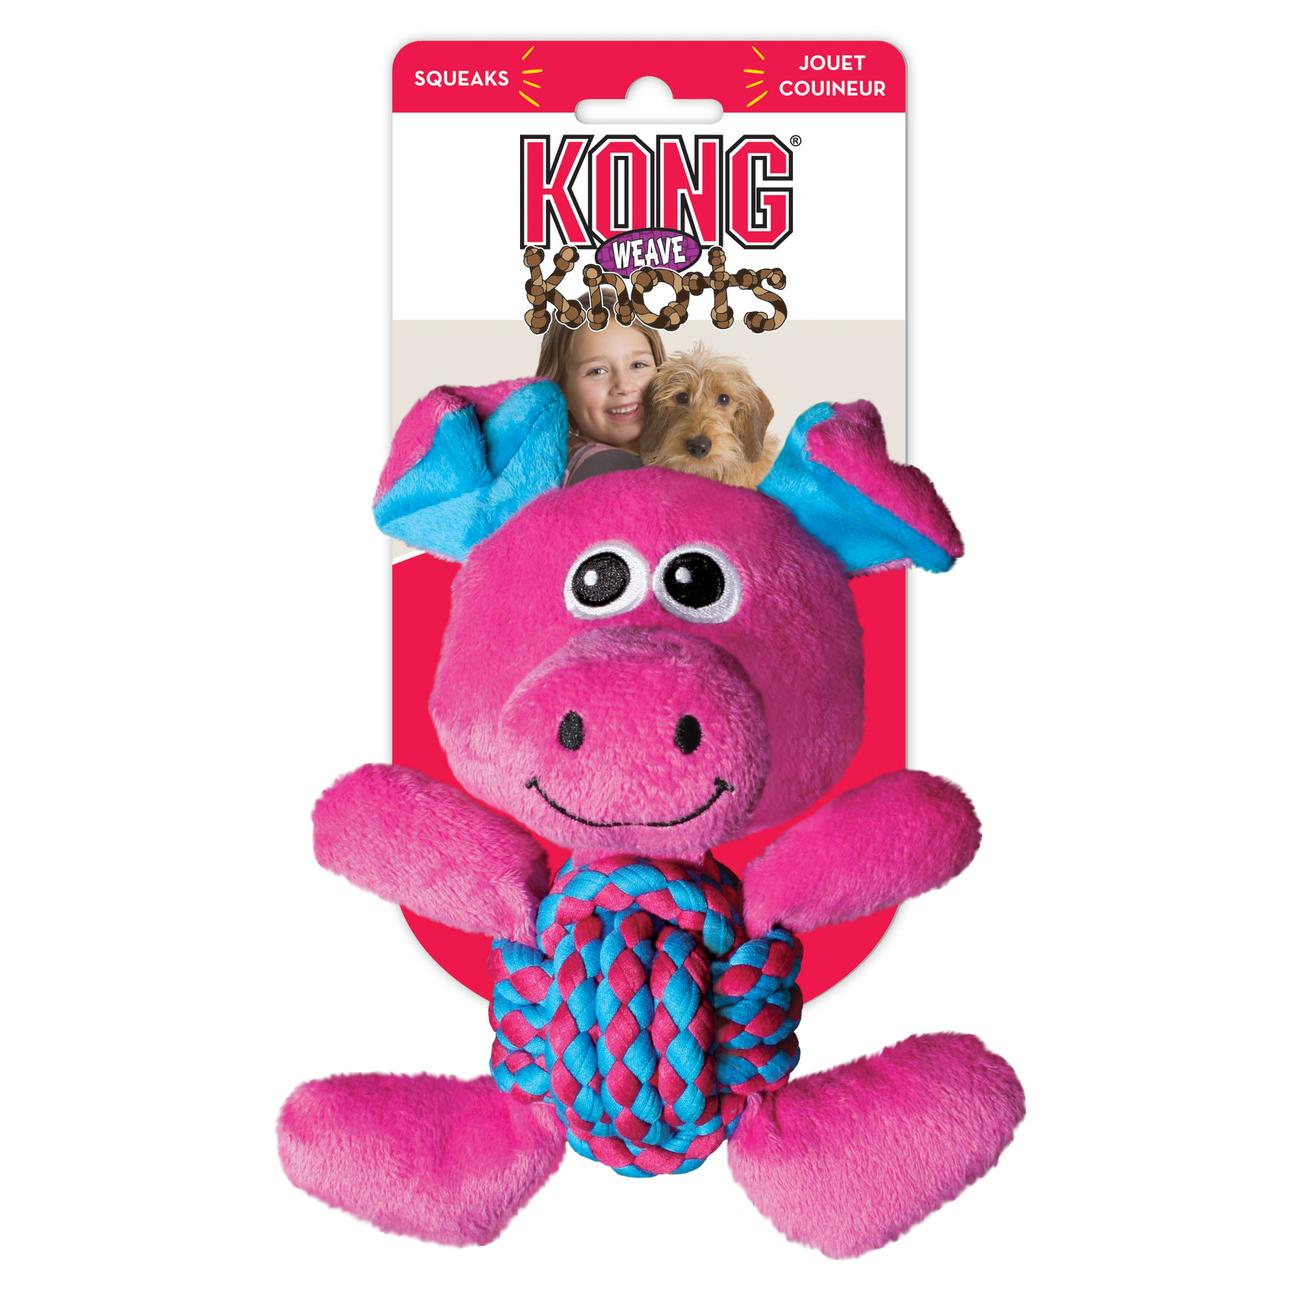 KONG Weave Knots Hundespielzeug, Bild 3